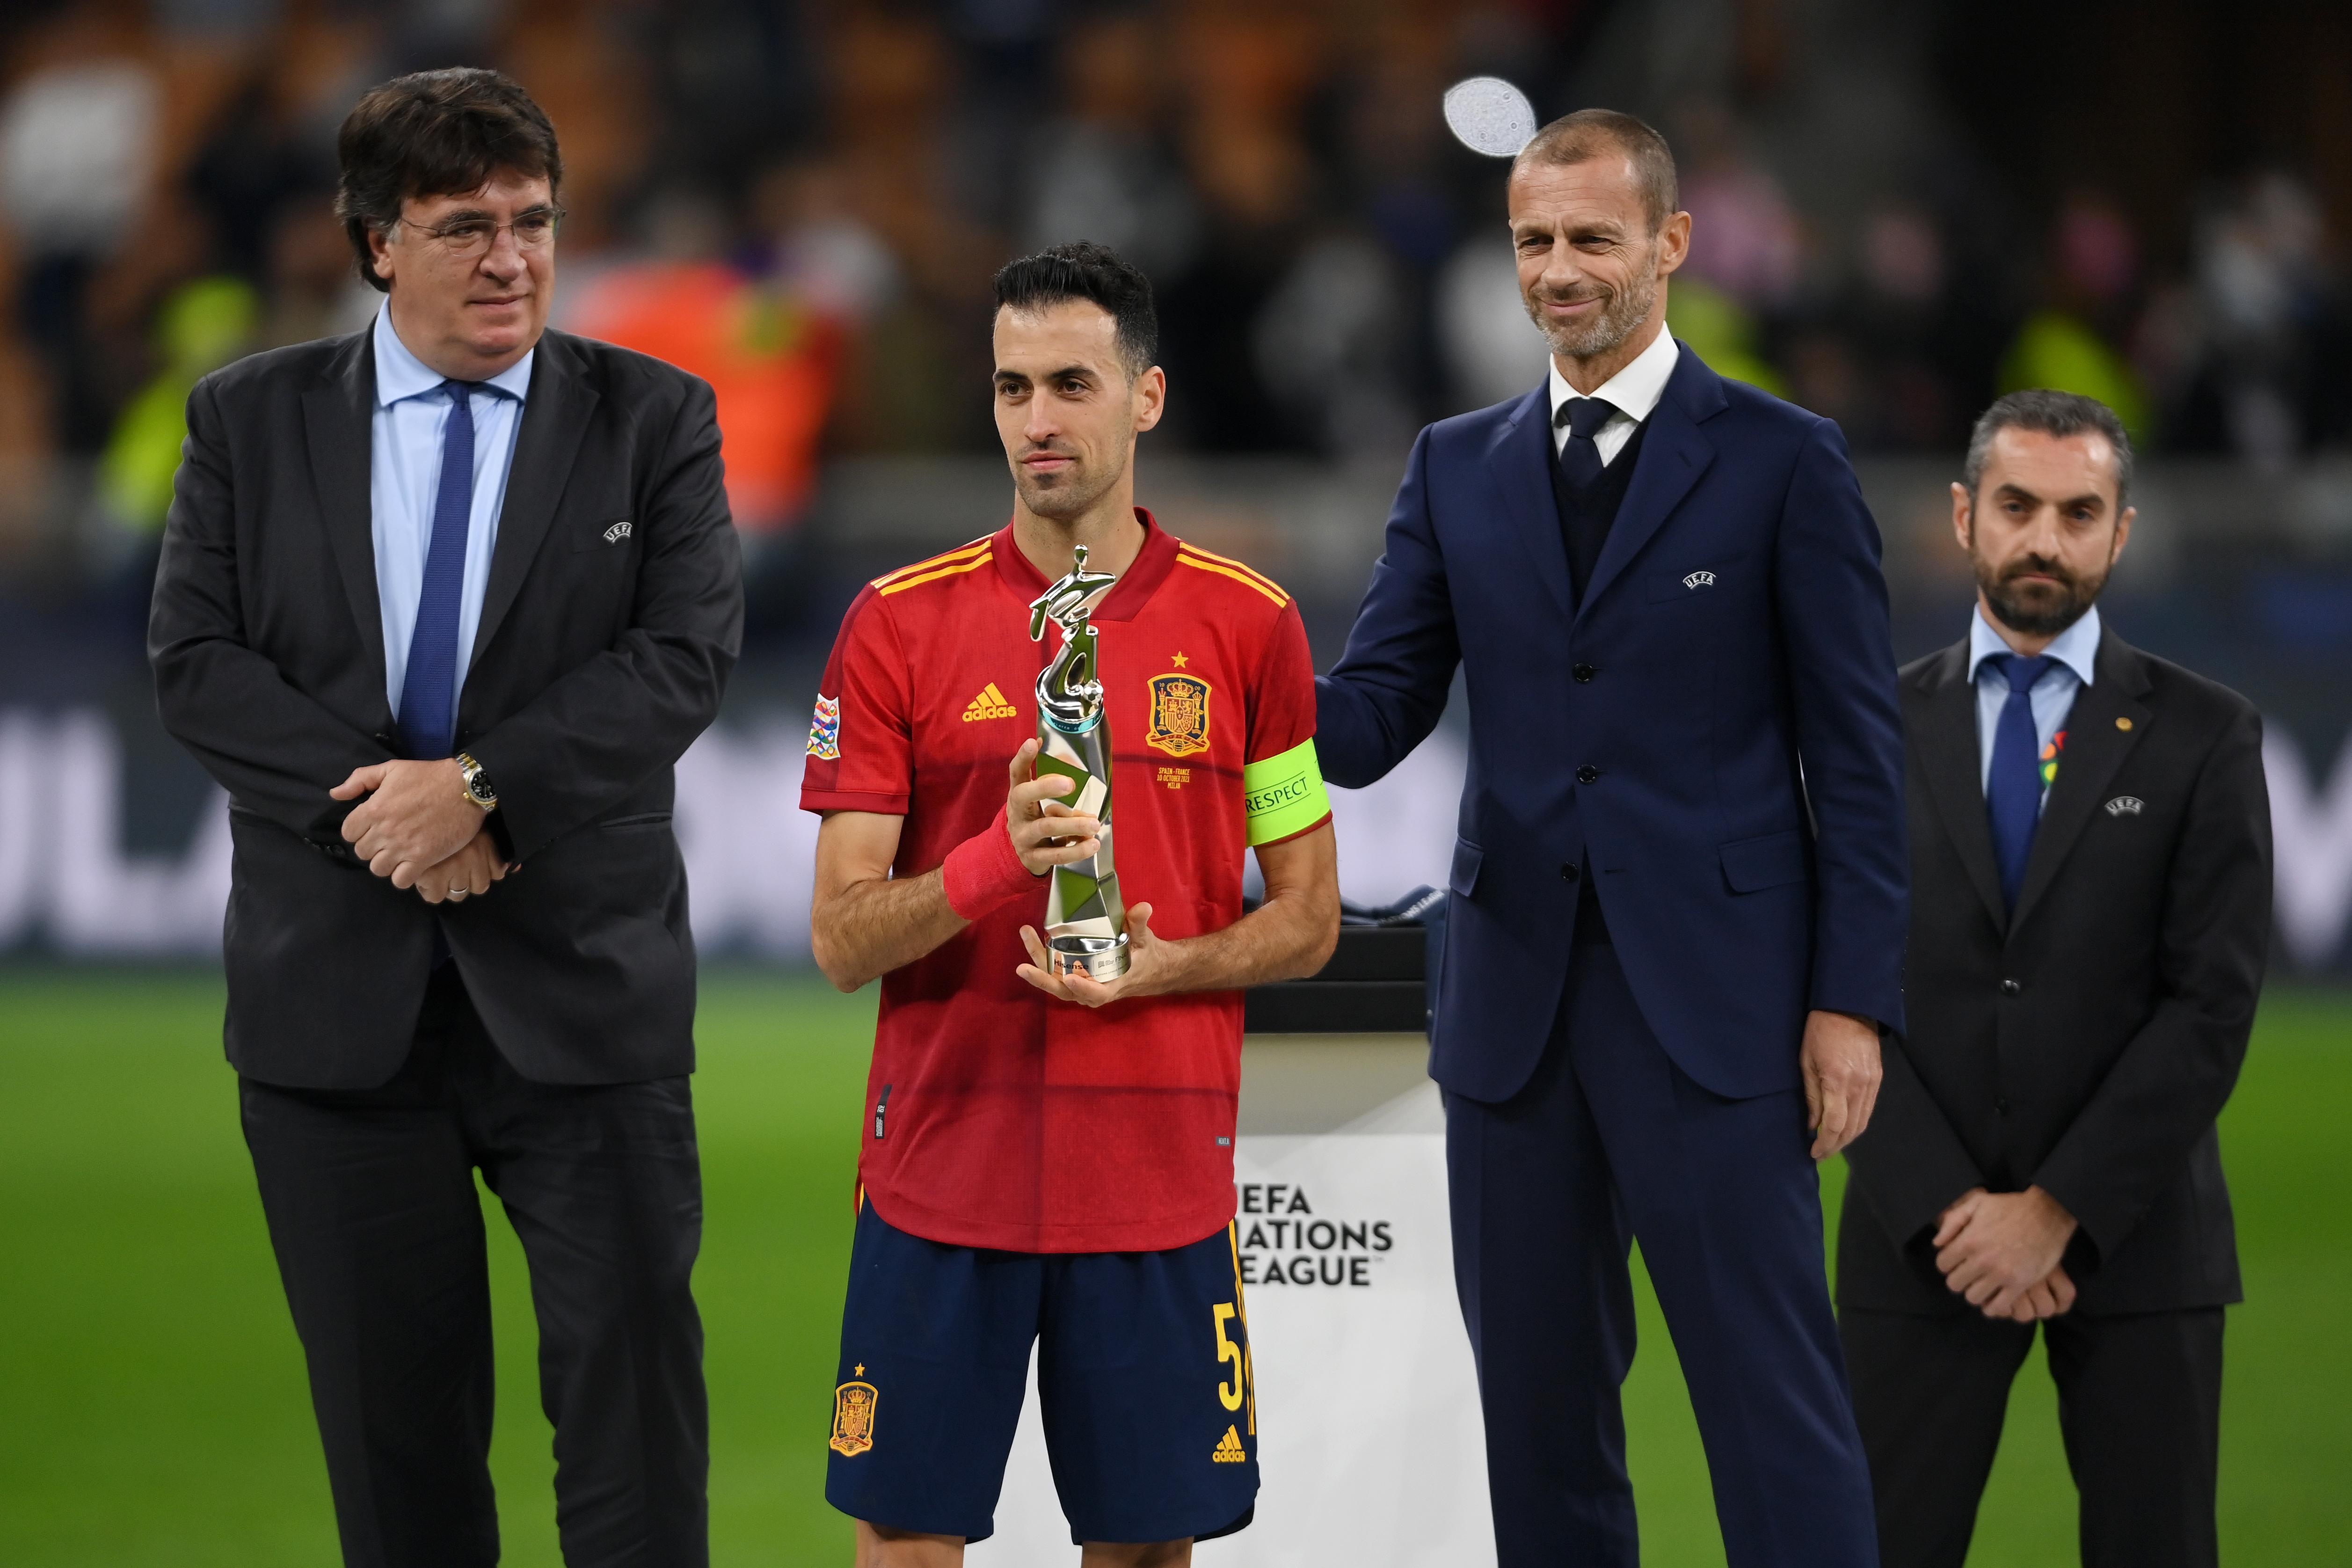 Spain v France – UEFA Nations League 2021 Final